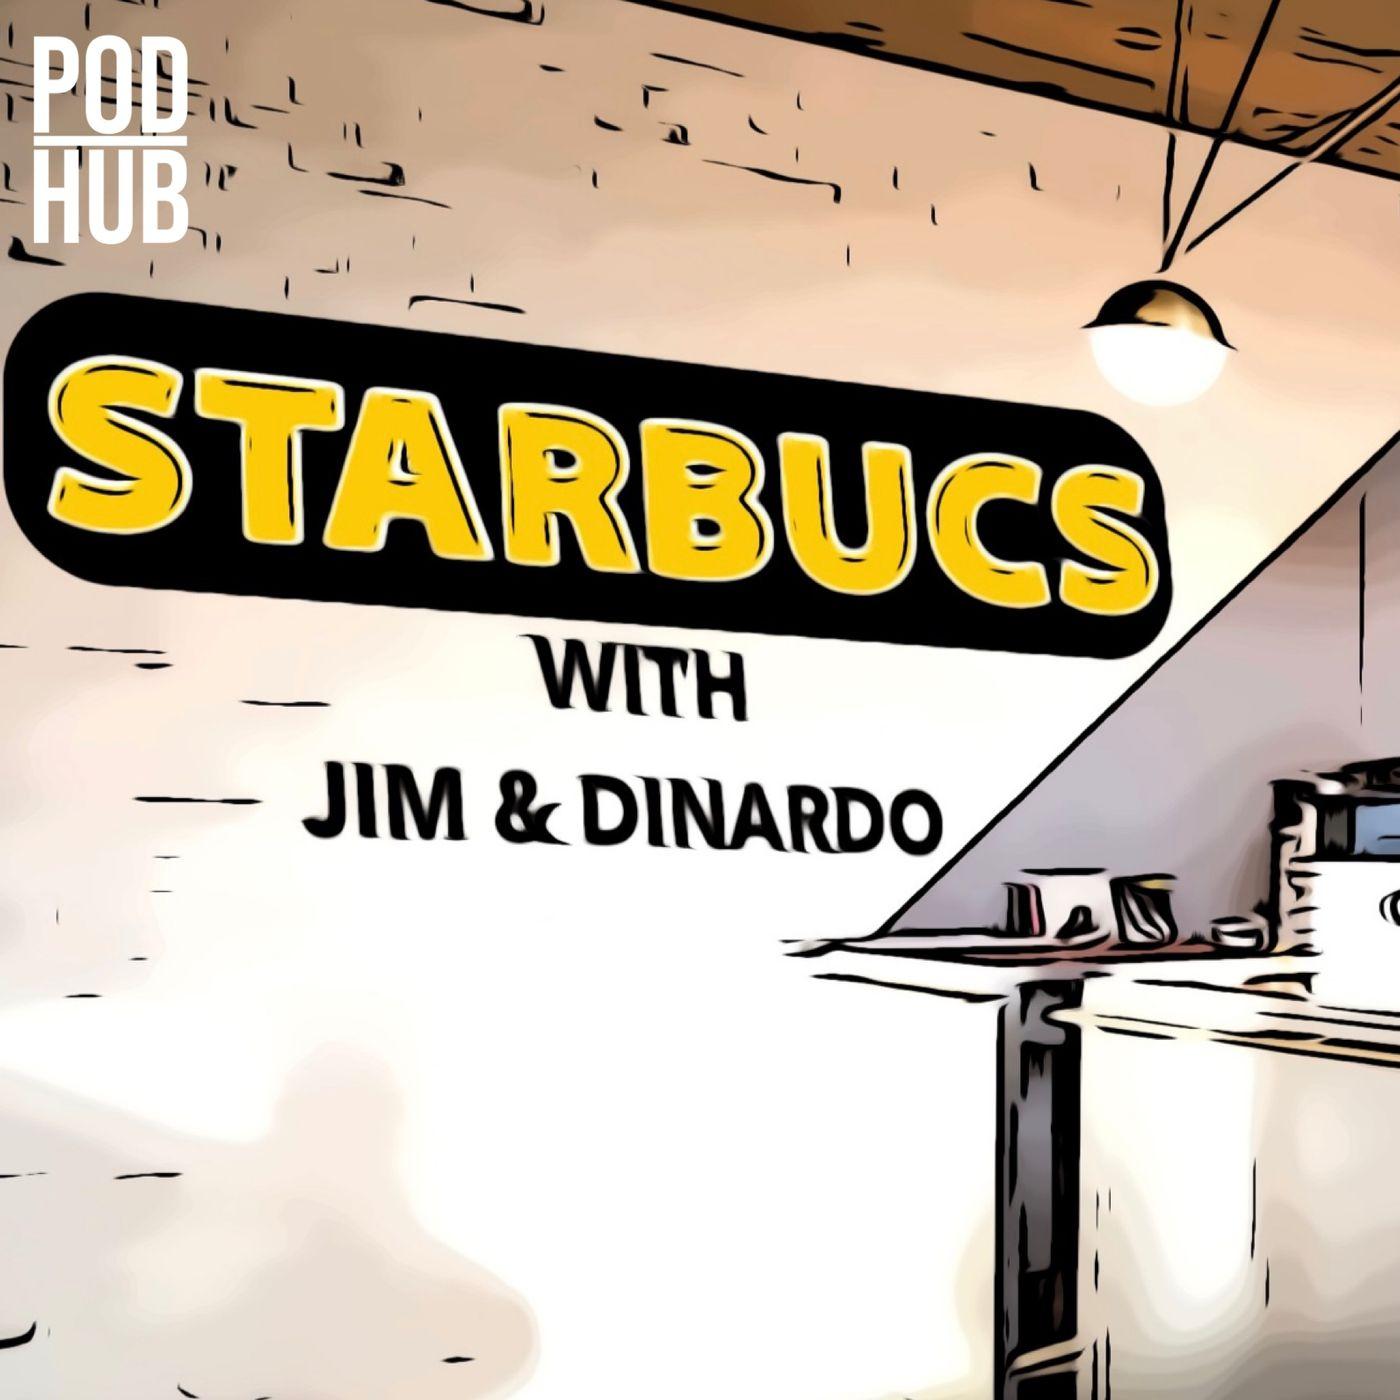 Starbucs - Low On Fuel